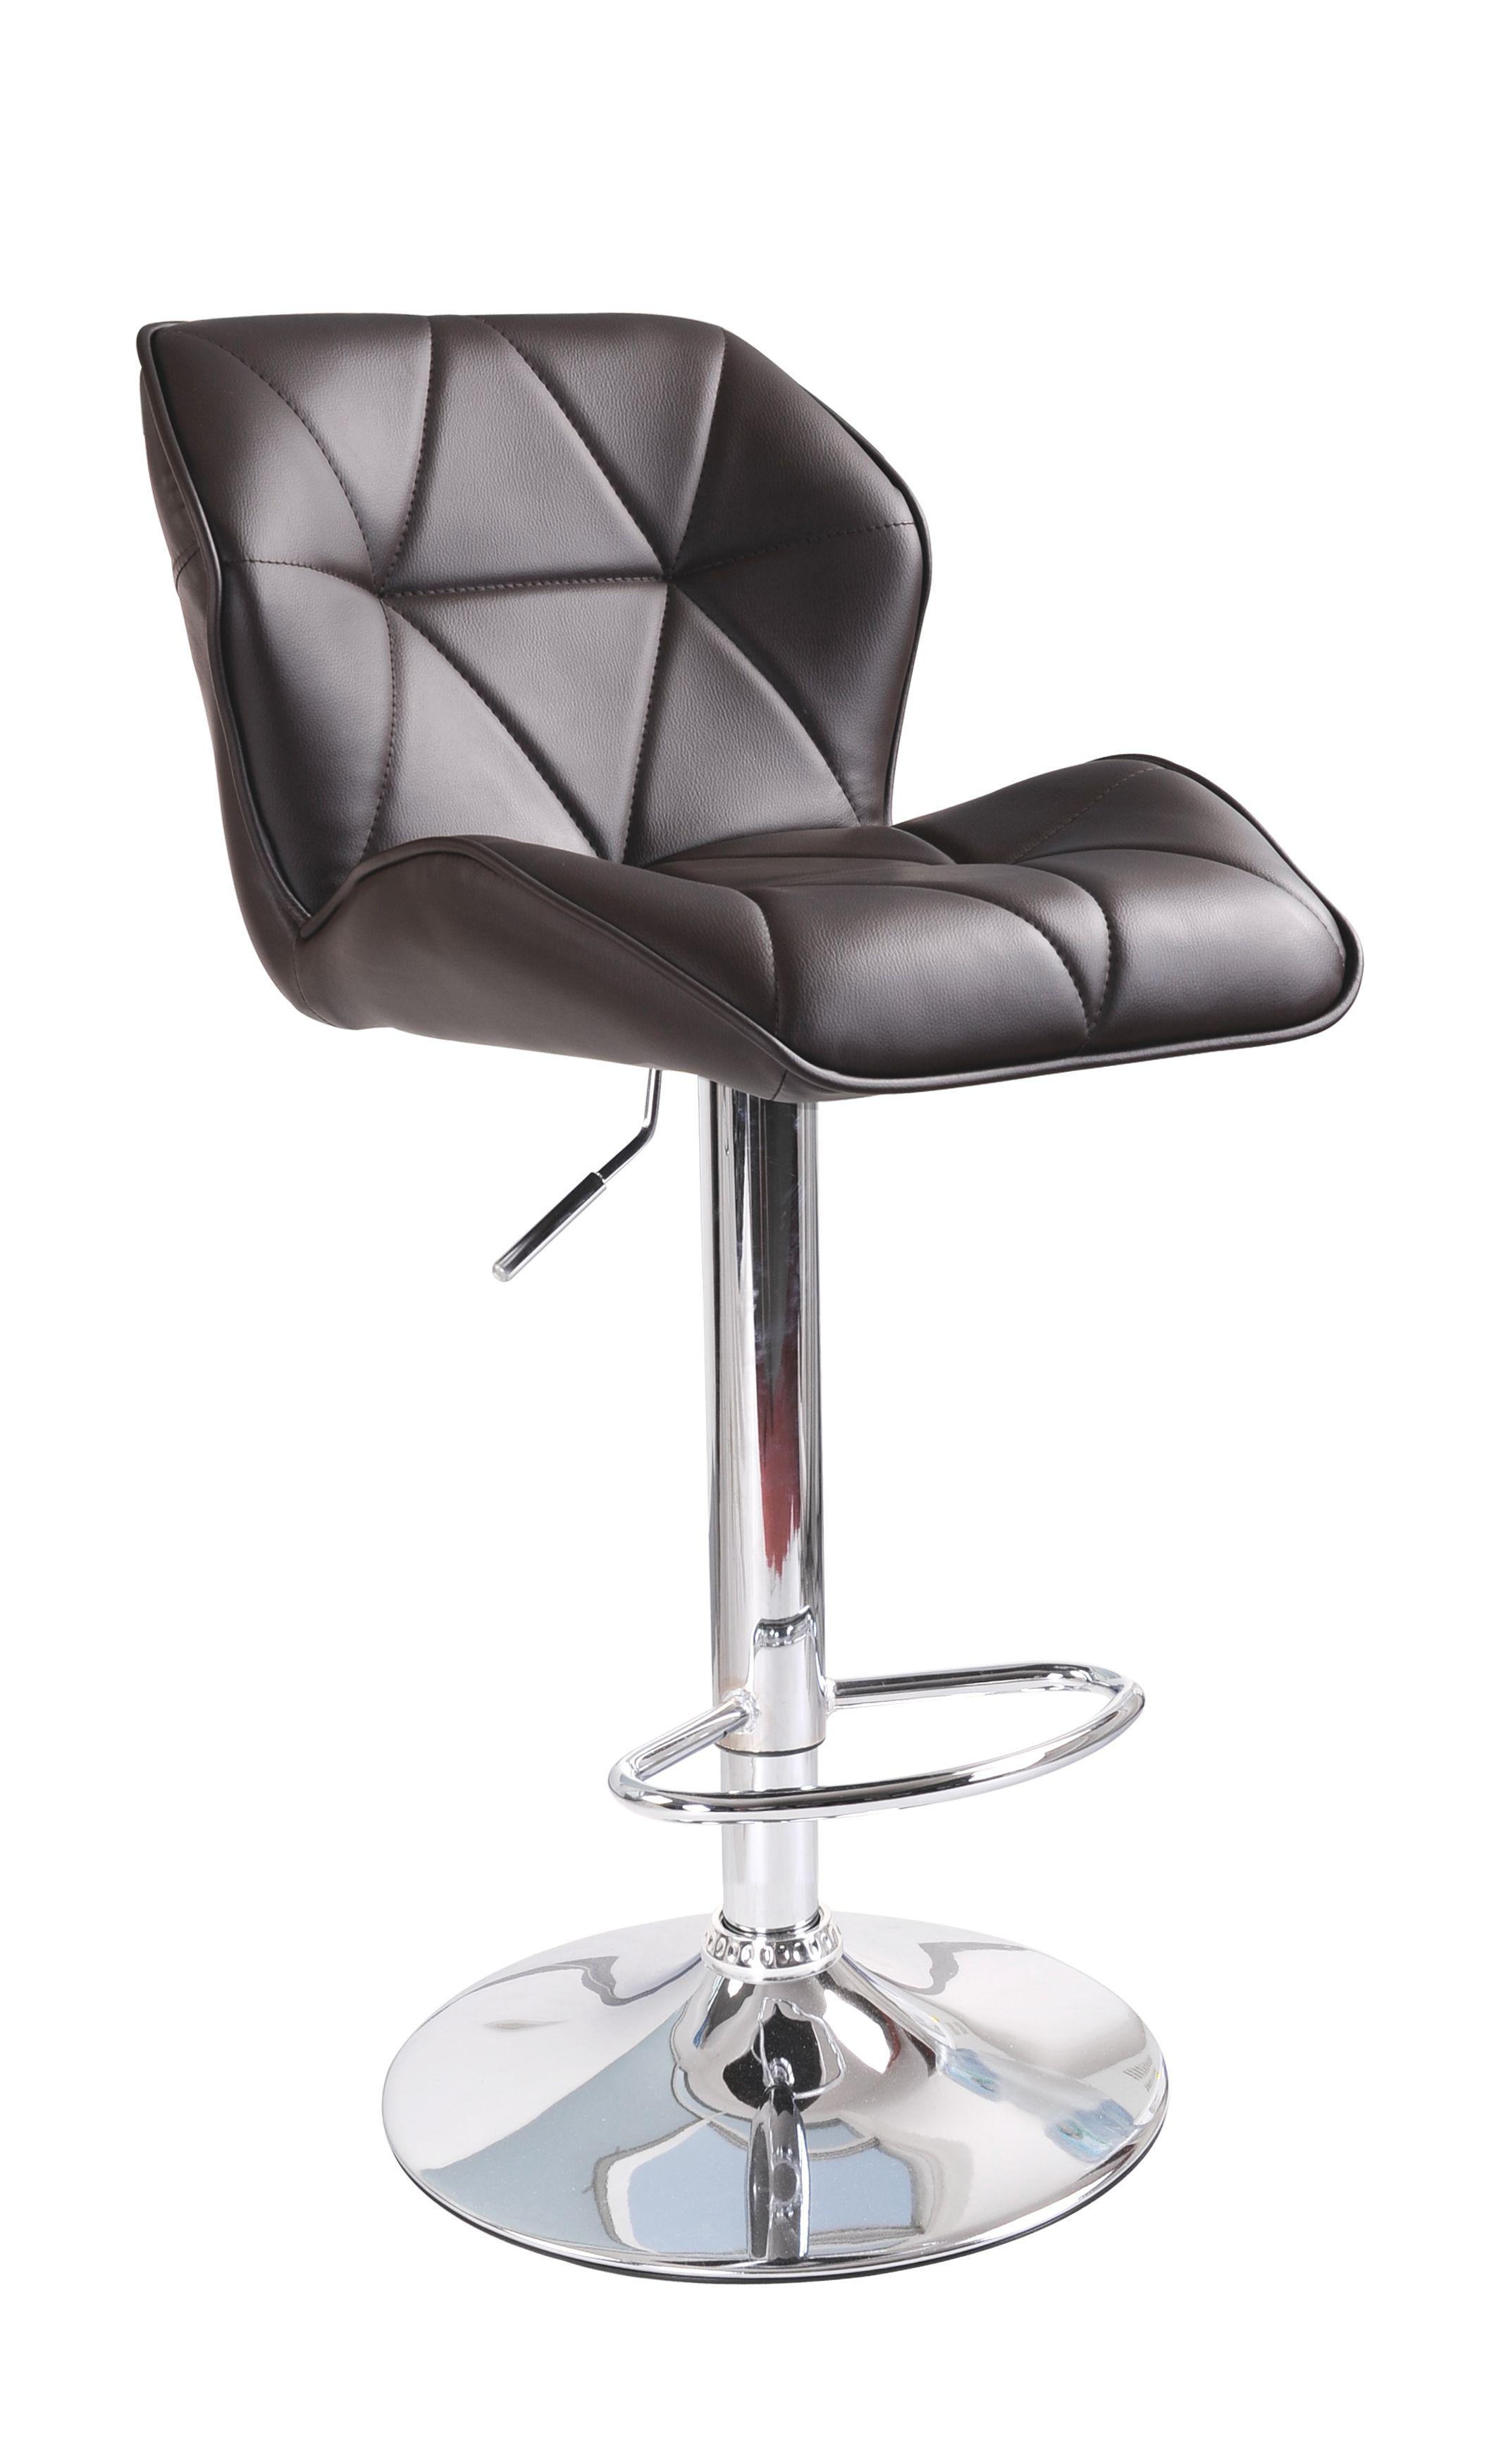 Fabric Upholstered Bar Stools Uk Https Ift Tt 2mtj8ip Bar